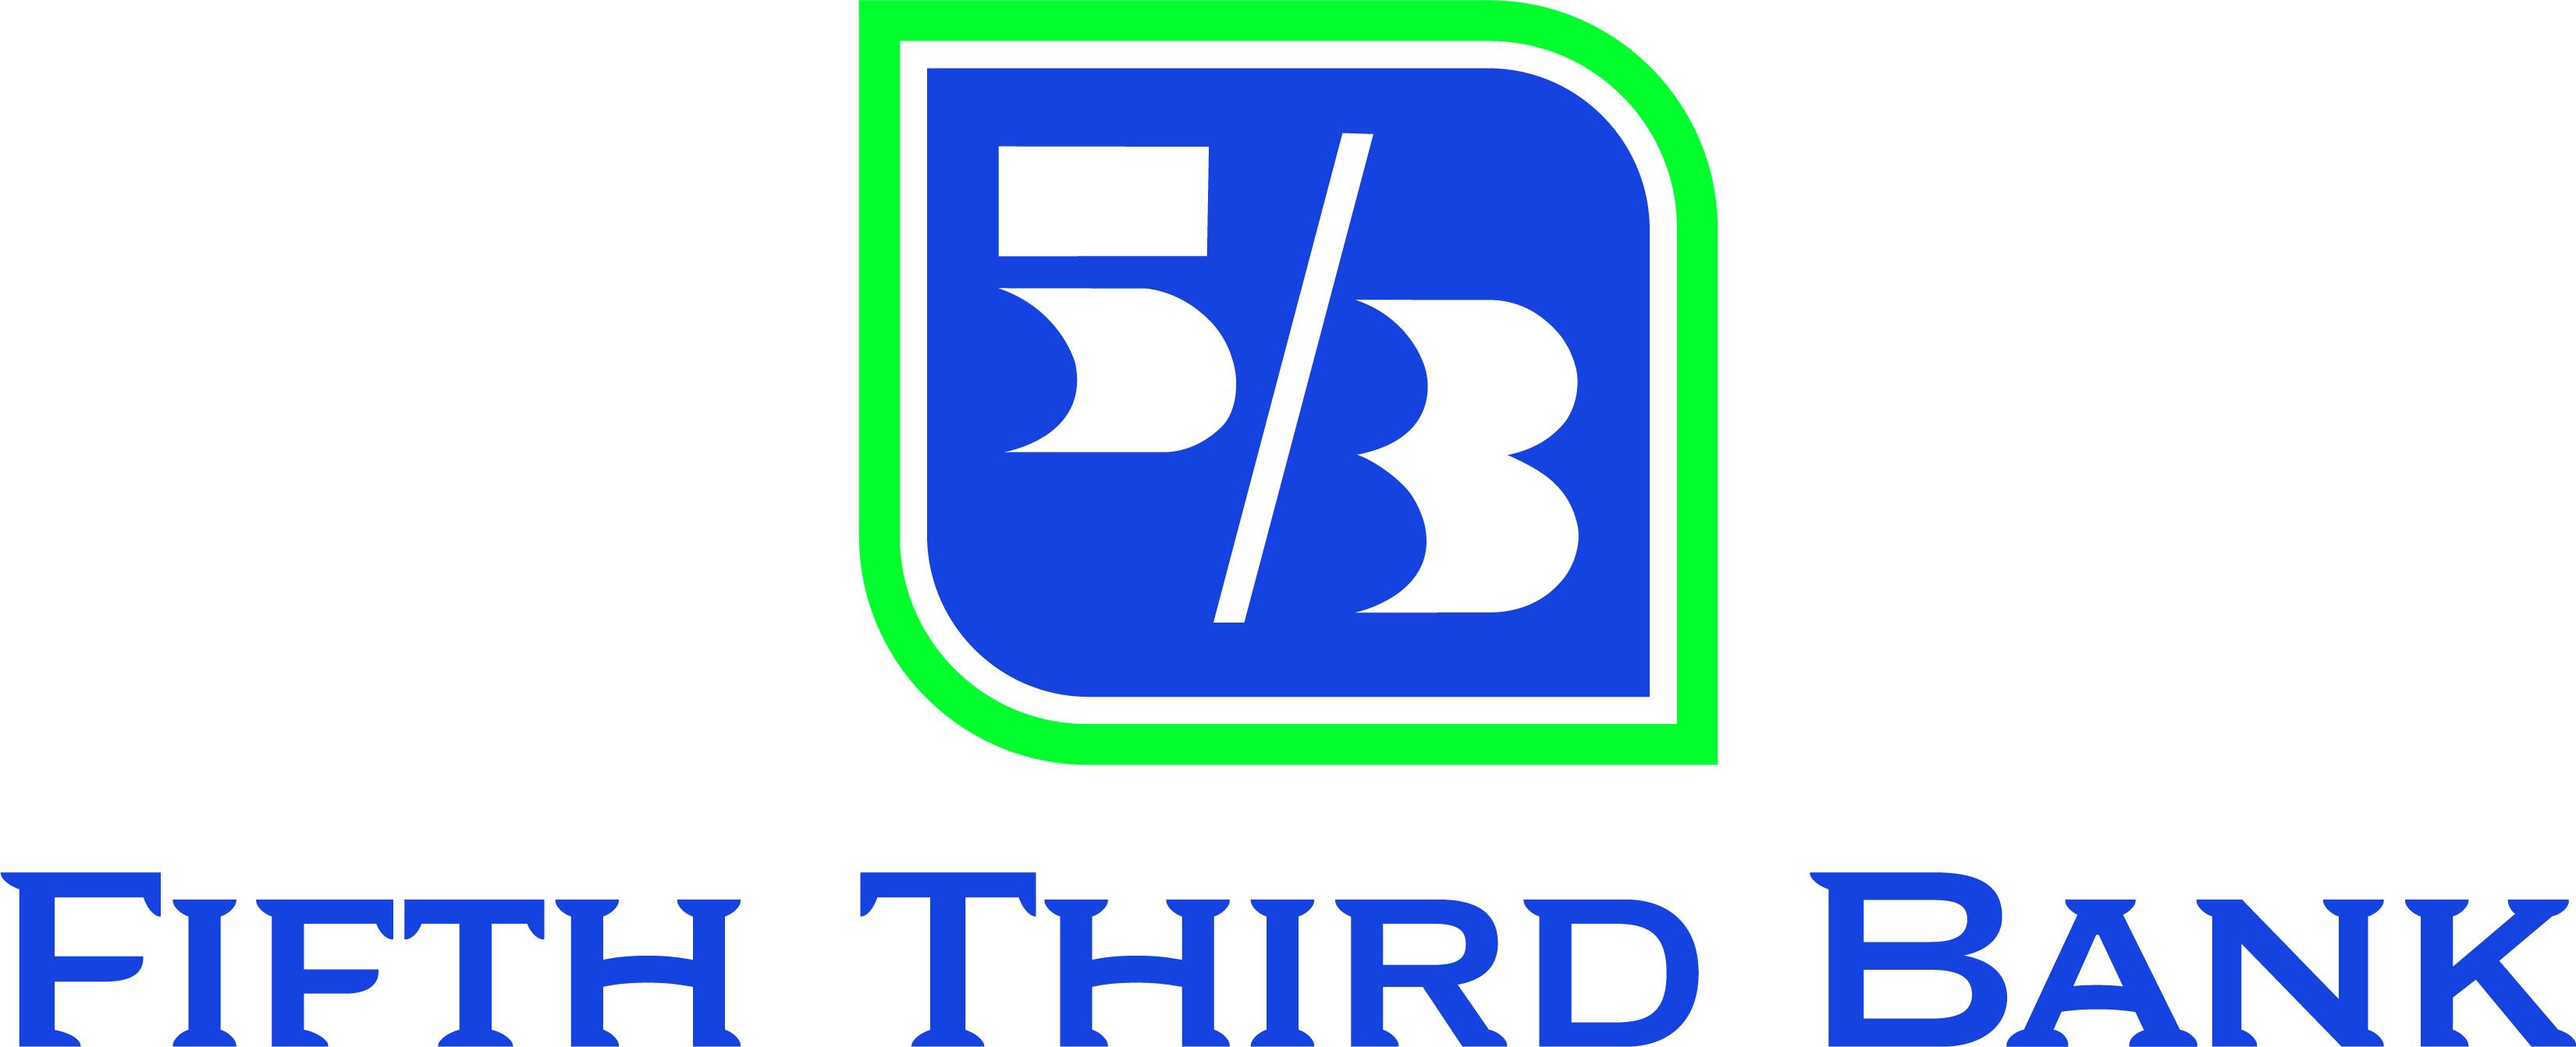 https://growthzonesitesprod.azureedge.net/wp-content/uploads/sites/1735/2021/01/Fifth-Third-Bank-Logo.jpg